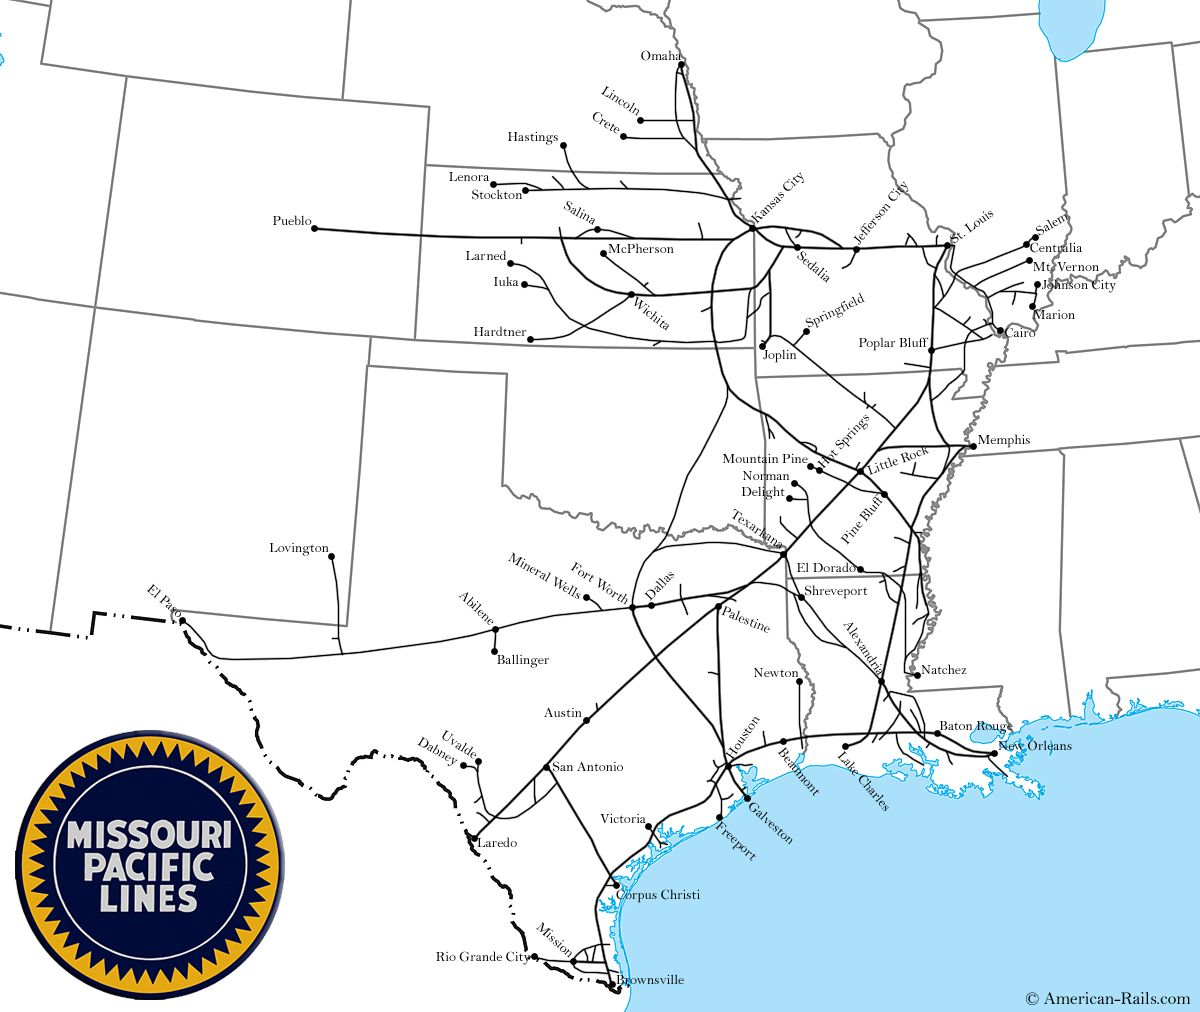 Missouri Pacific Railroad Map Missouri Pacific RR Pinterest - Us railroad map 1865